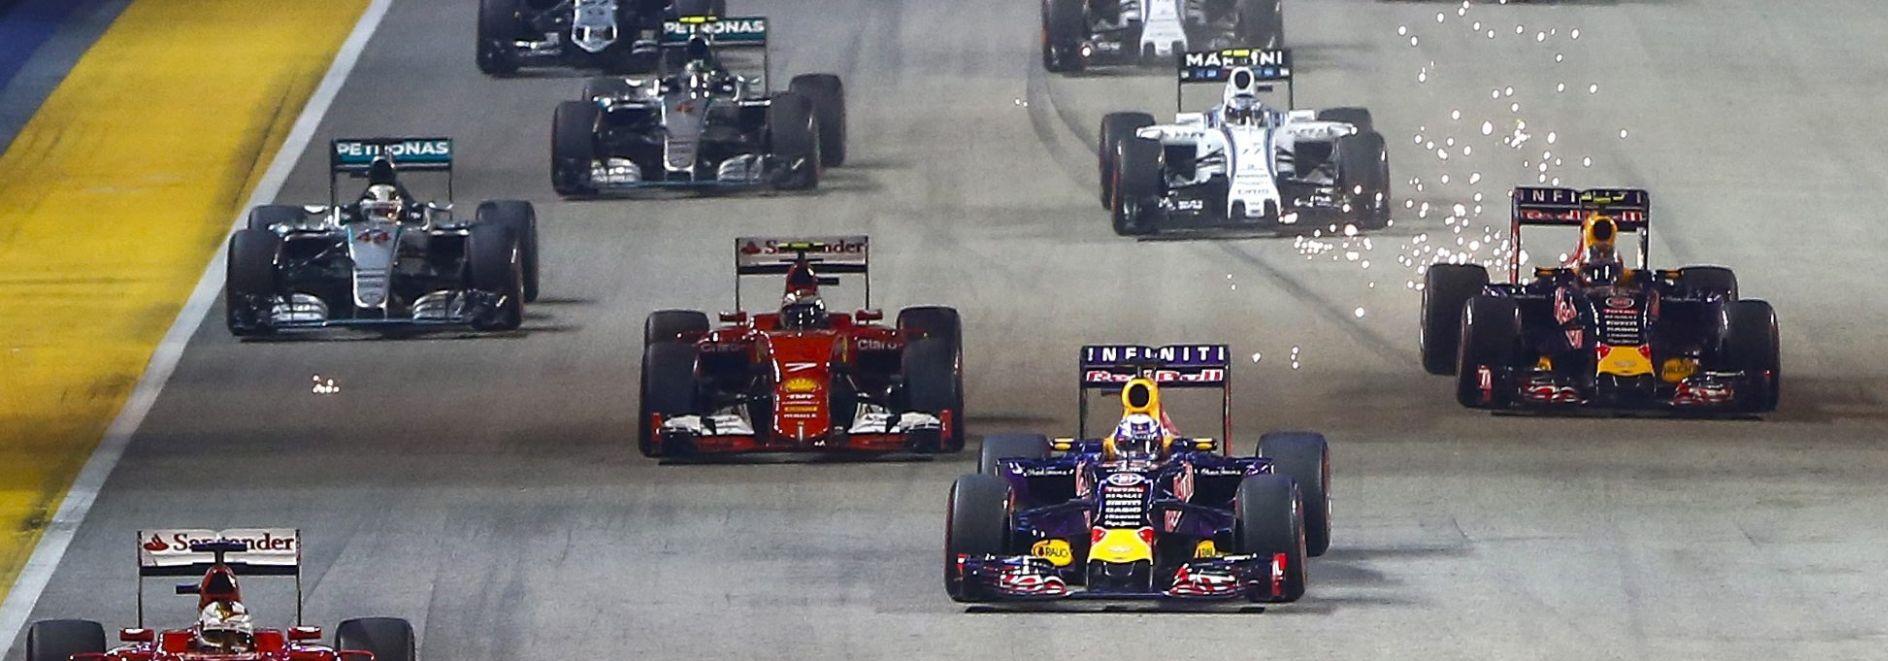 FORMULA 1 Vettelu Singapur, Hamilton odustao